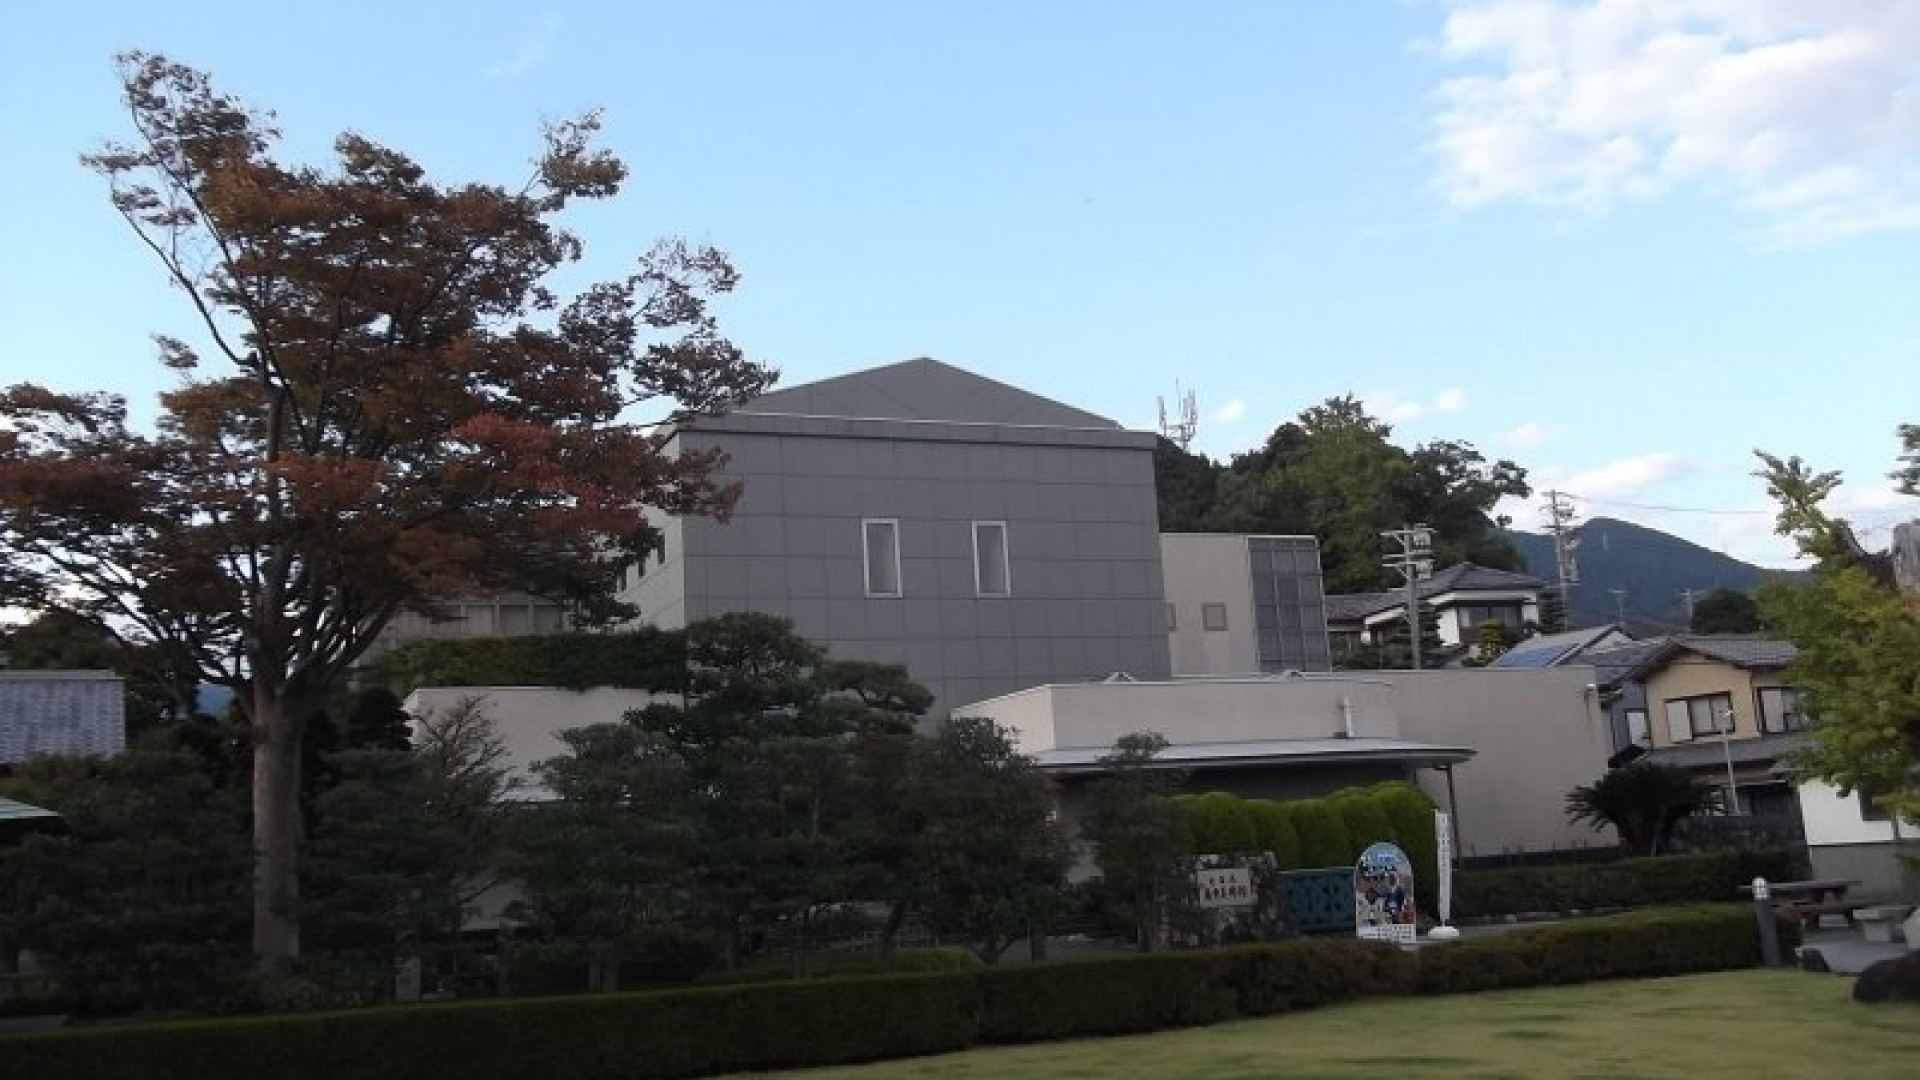 Shizuoka Stadt Tokaido Hiroshige Kunstmuseum